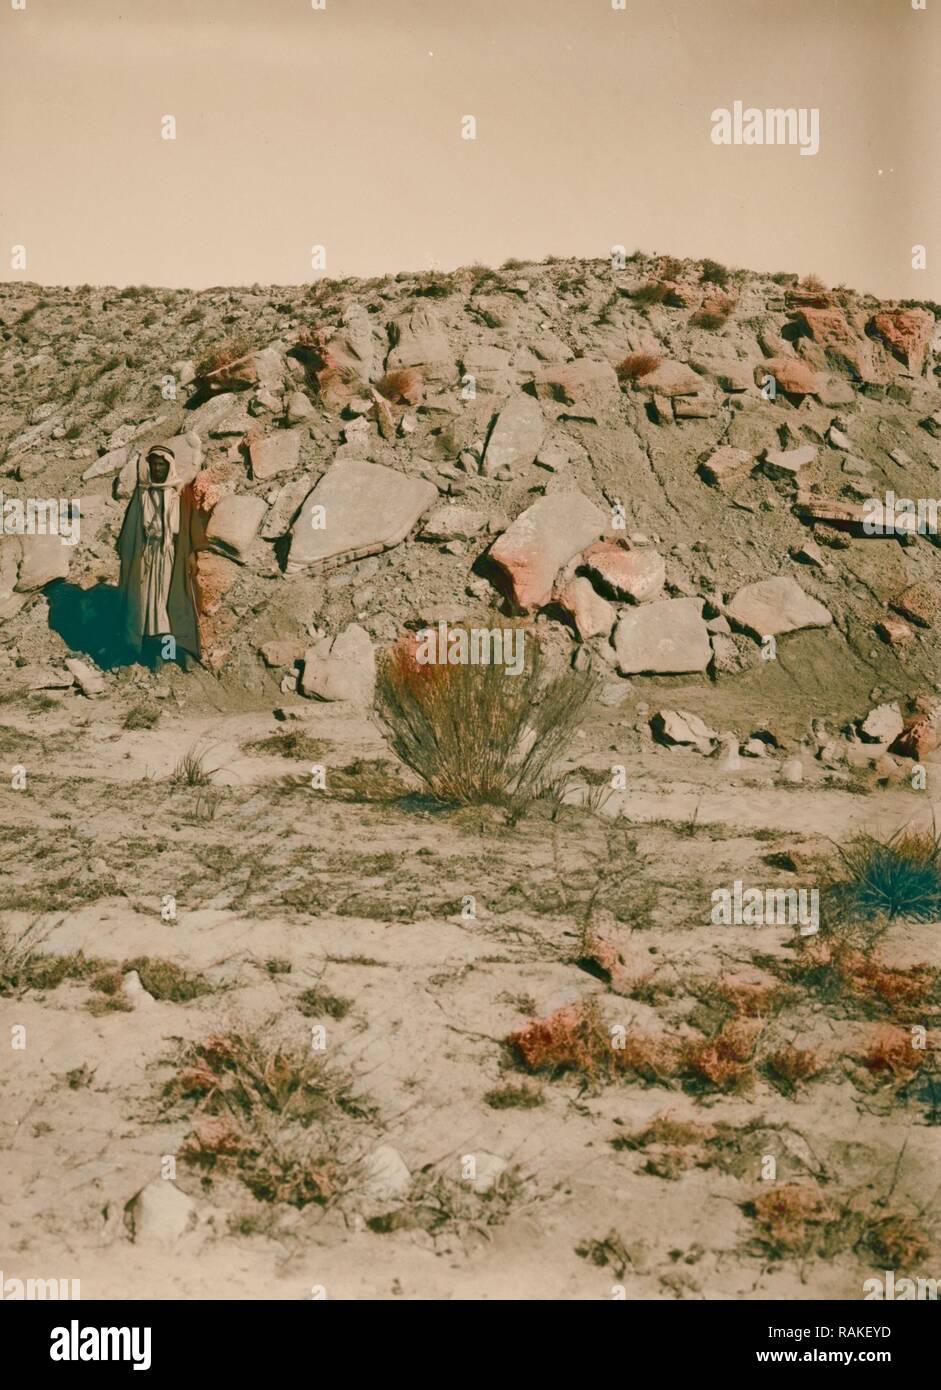 Geology. Neo Pliocene sand beds near Kurnub 1900, Israel, Mampsis (Extinct city). Reimagined by Gibon. Classic art reimagined - Stock Image